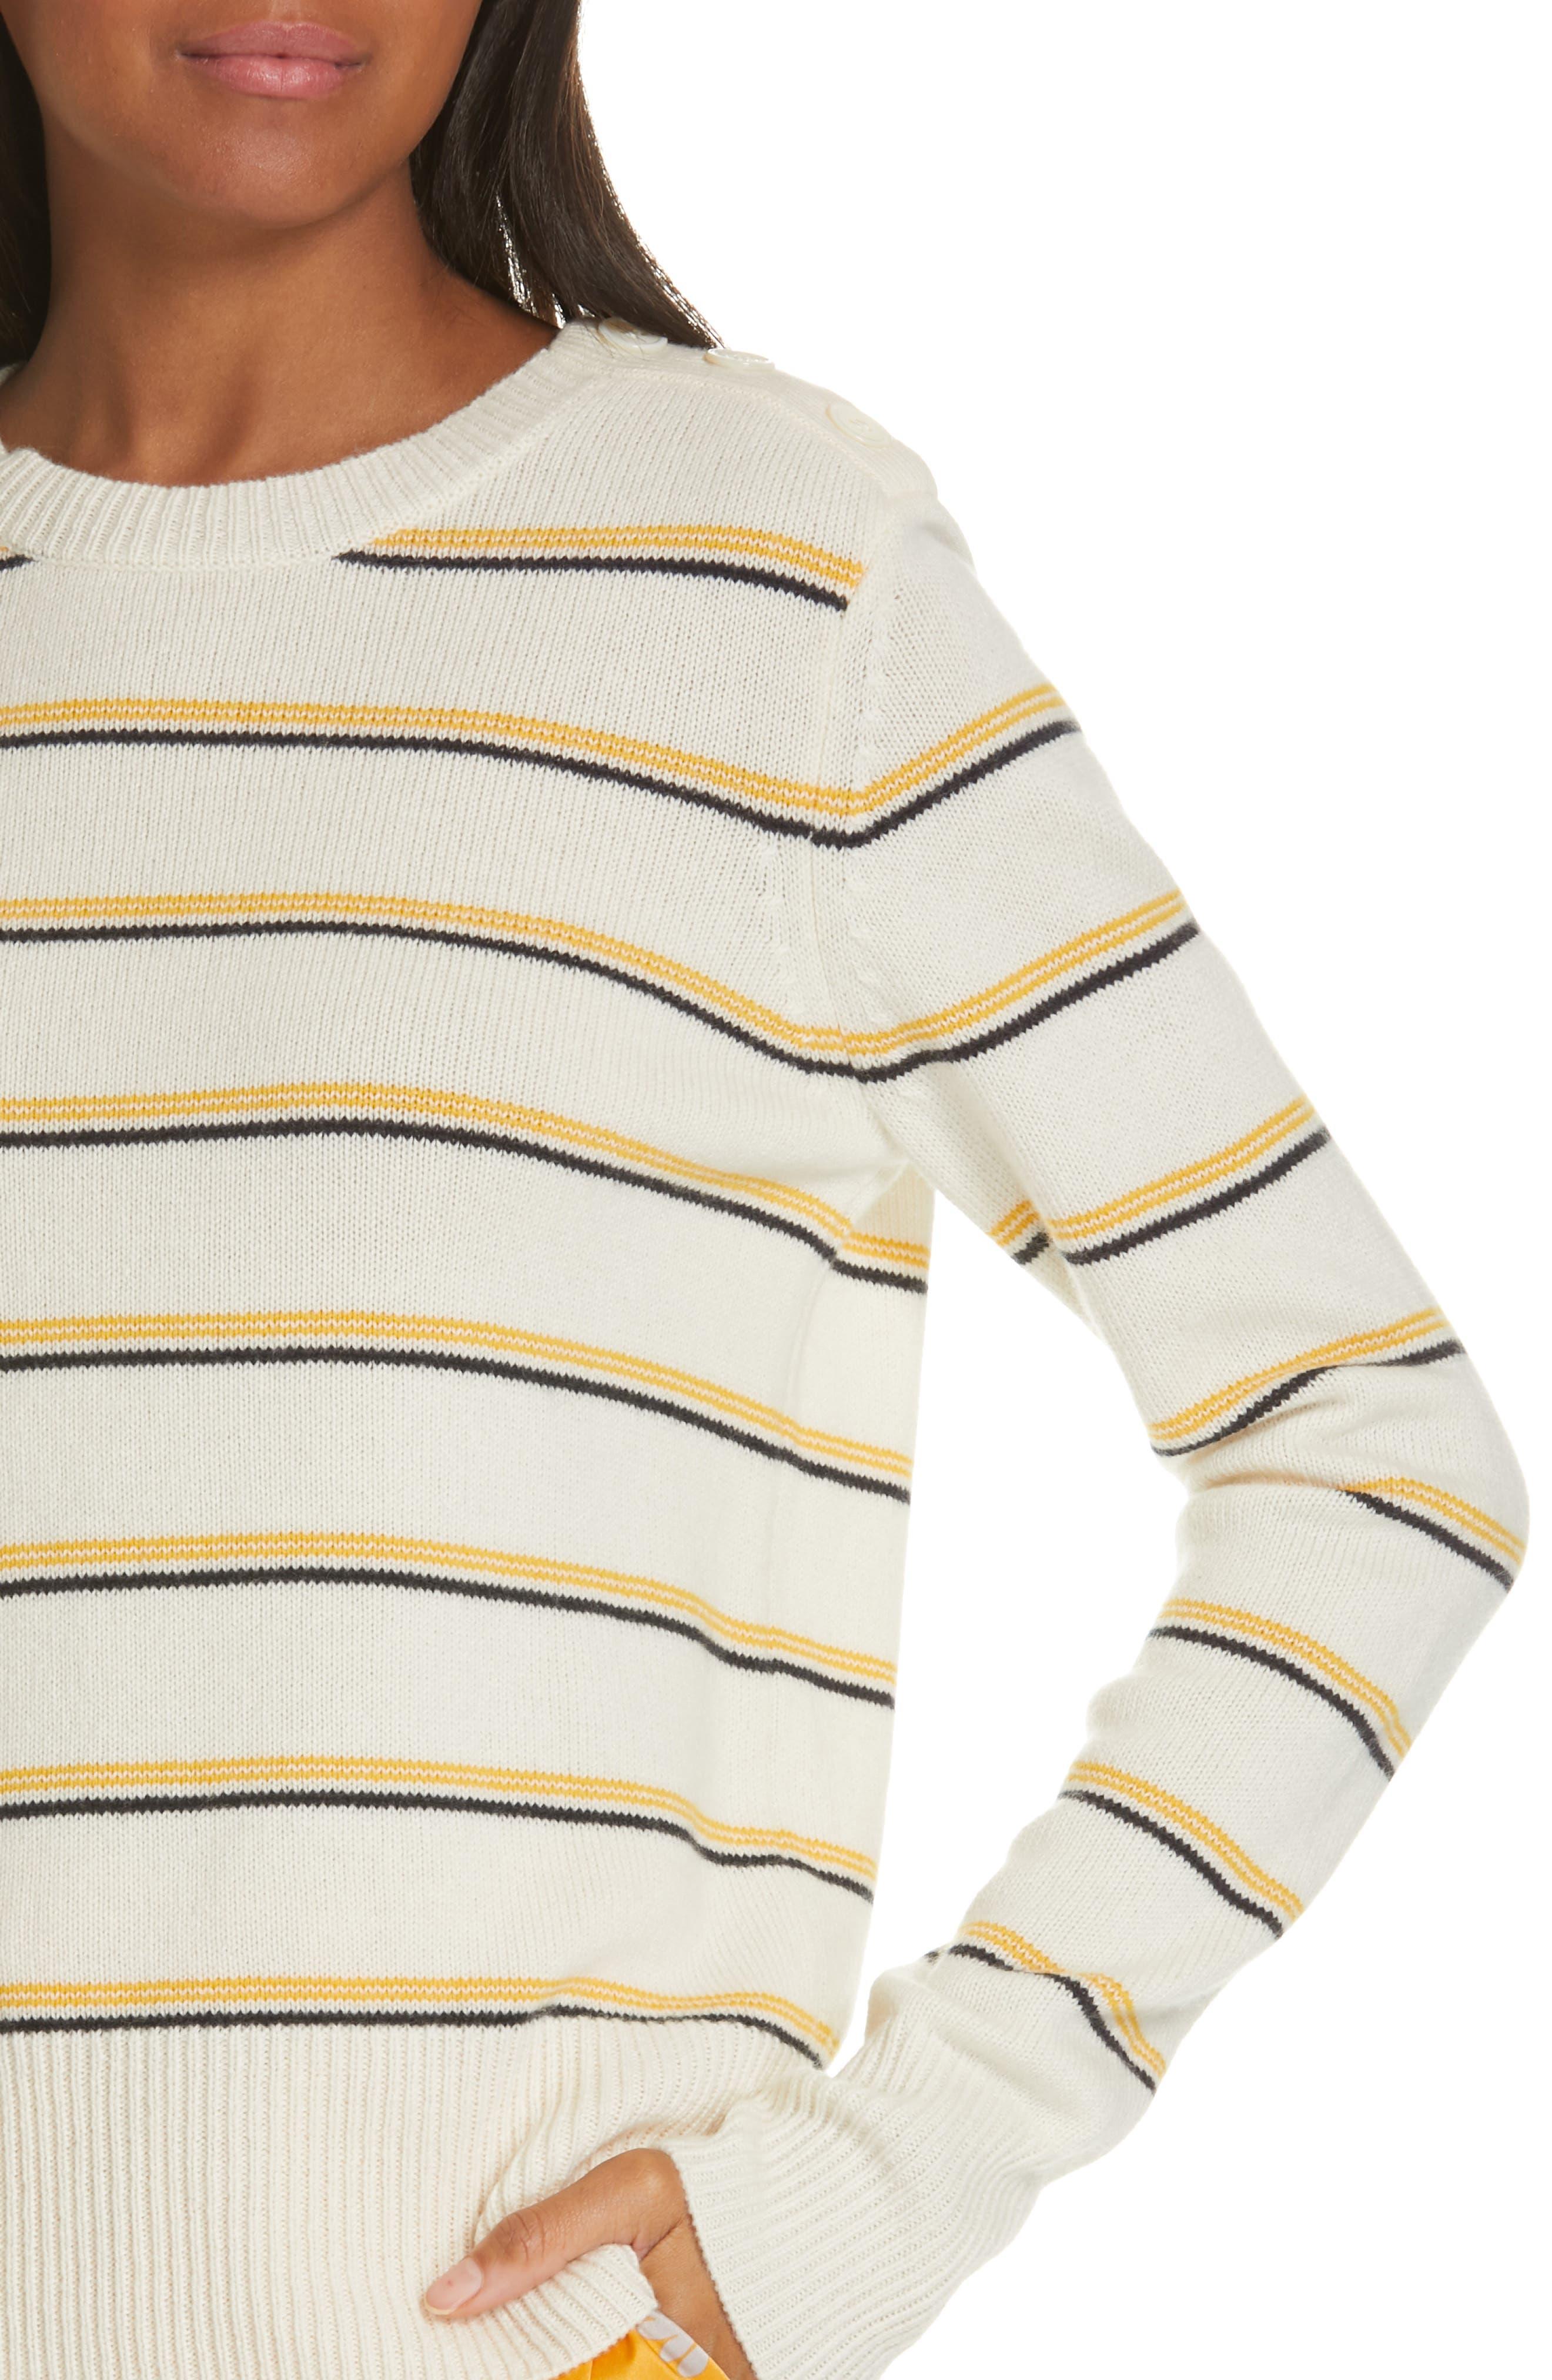 Duru Wool & Cashmere Sweater,                             Alternate thumbnail 4, color,                             NATURE WHITE MULTI